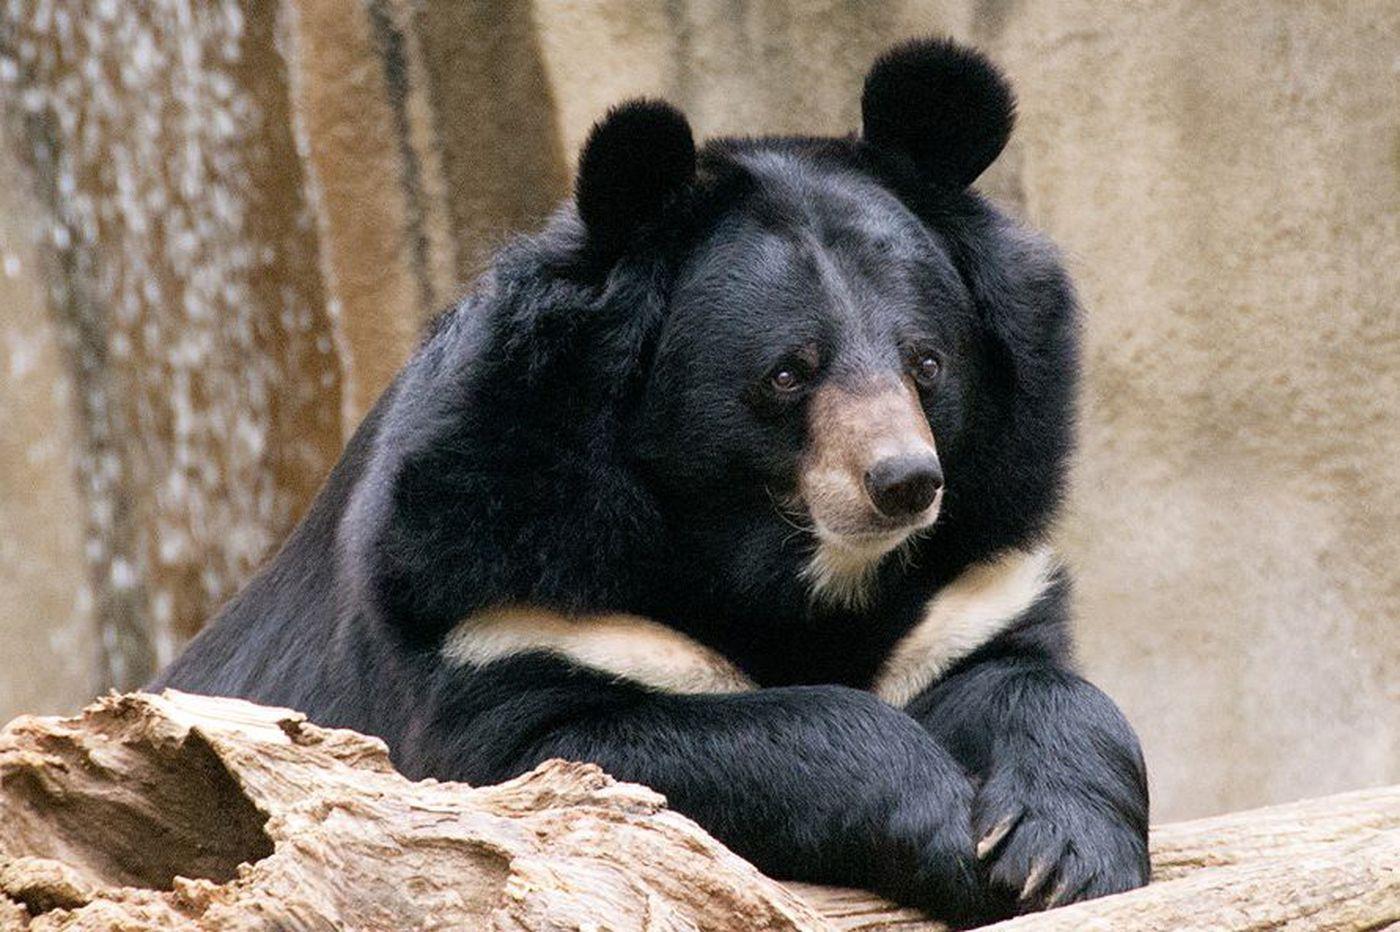 Philadelphia Zoo's Asian black bear dies